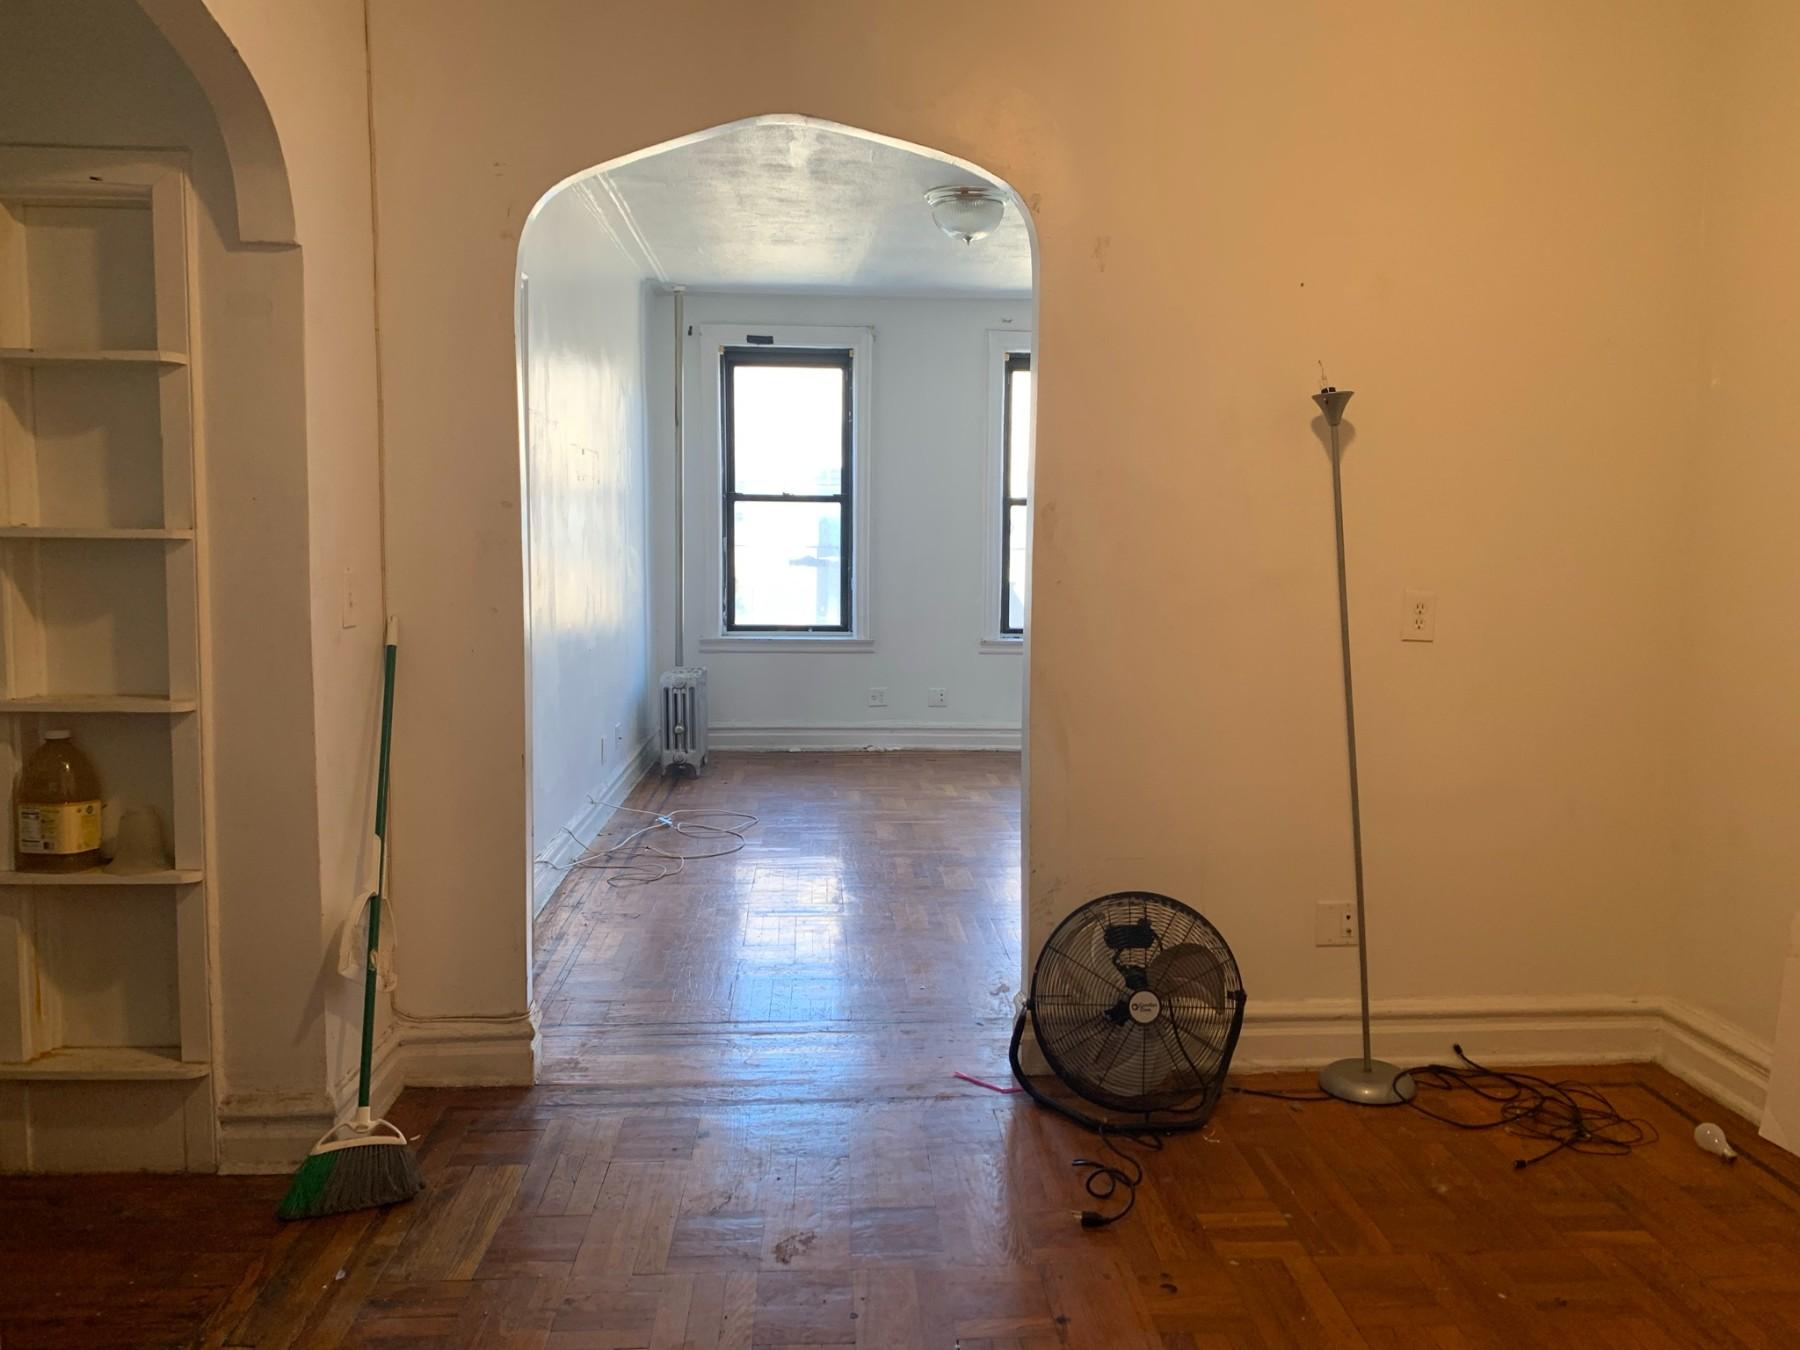 52 East 52nd Street East Flatbush Brooklyn NY 11203